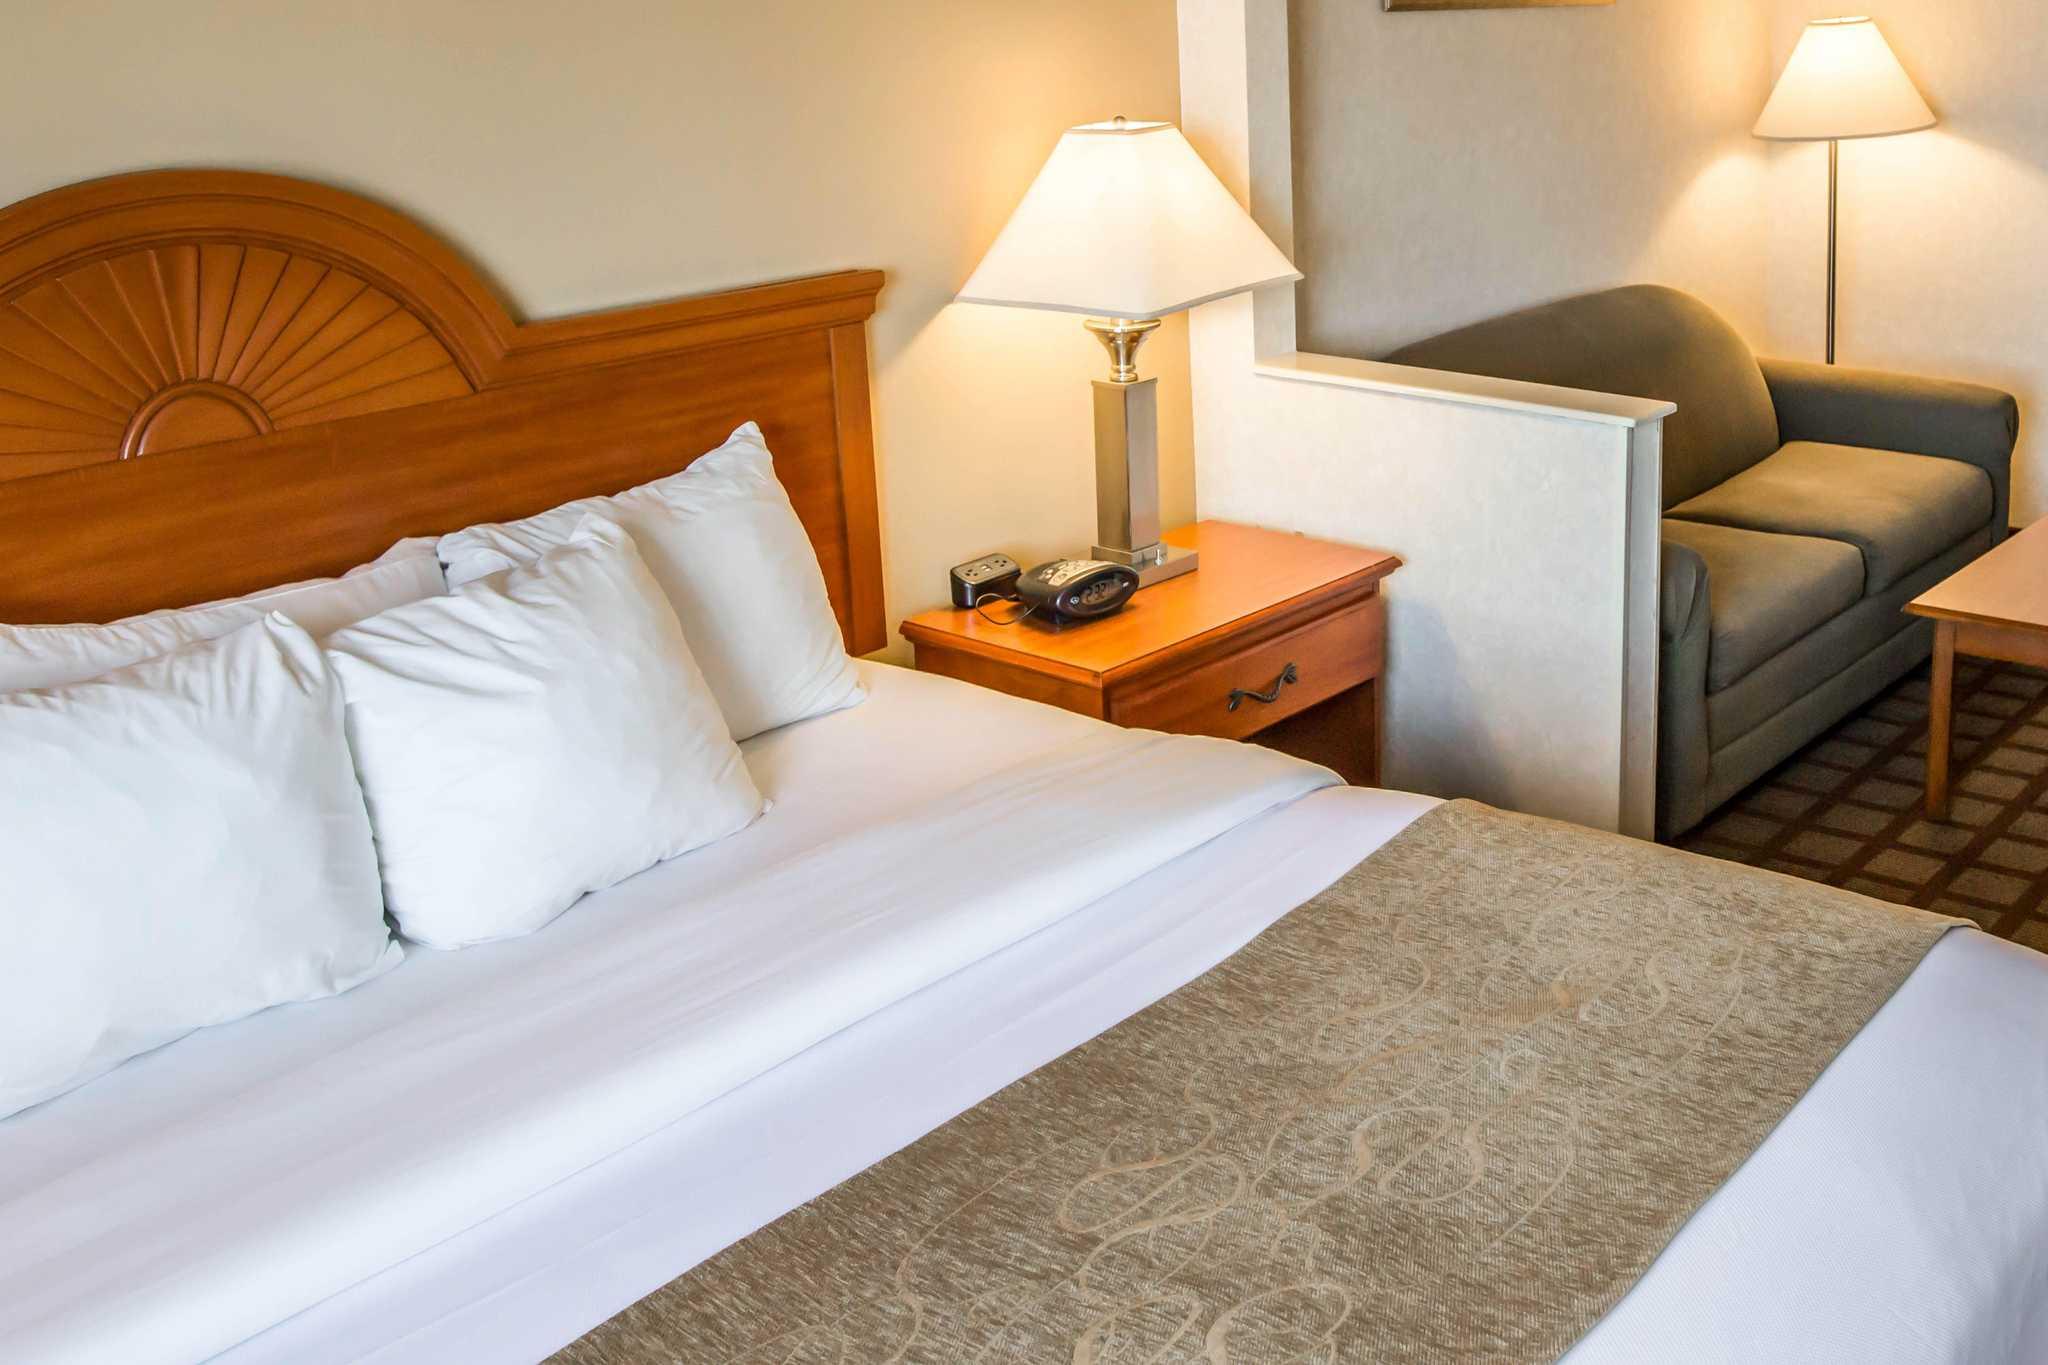 Comfort Suites image 30